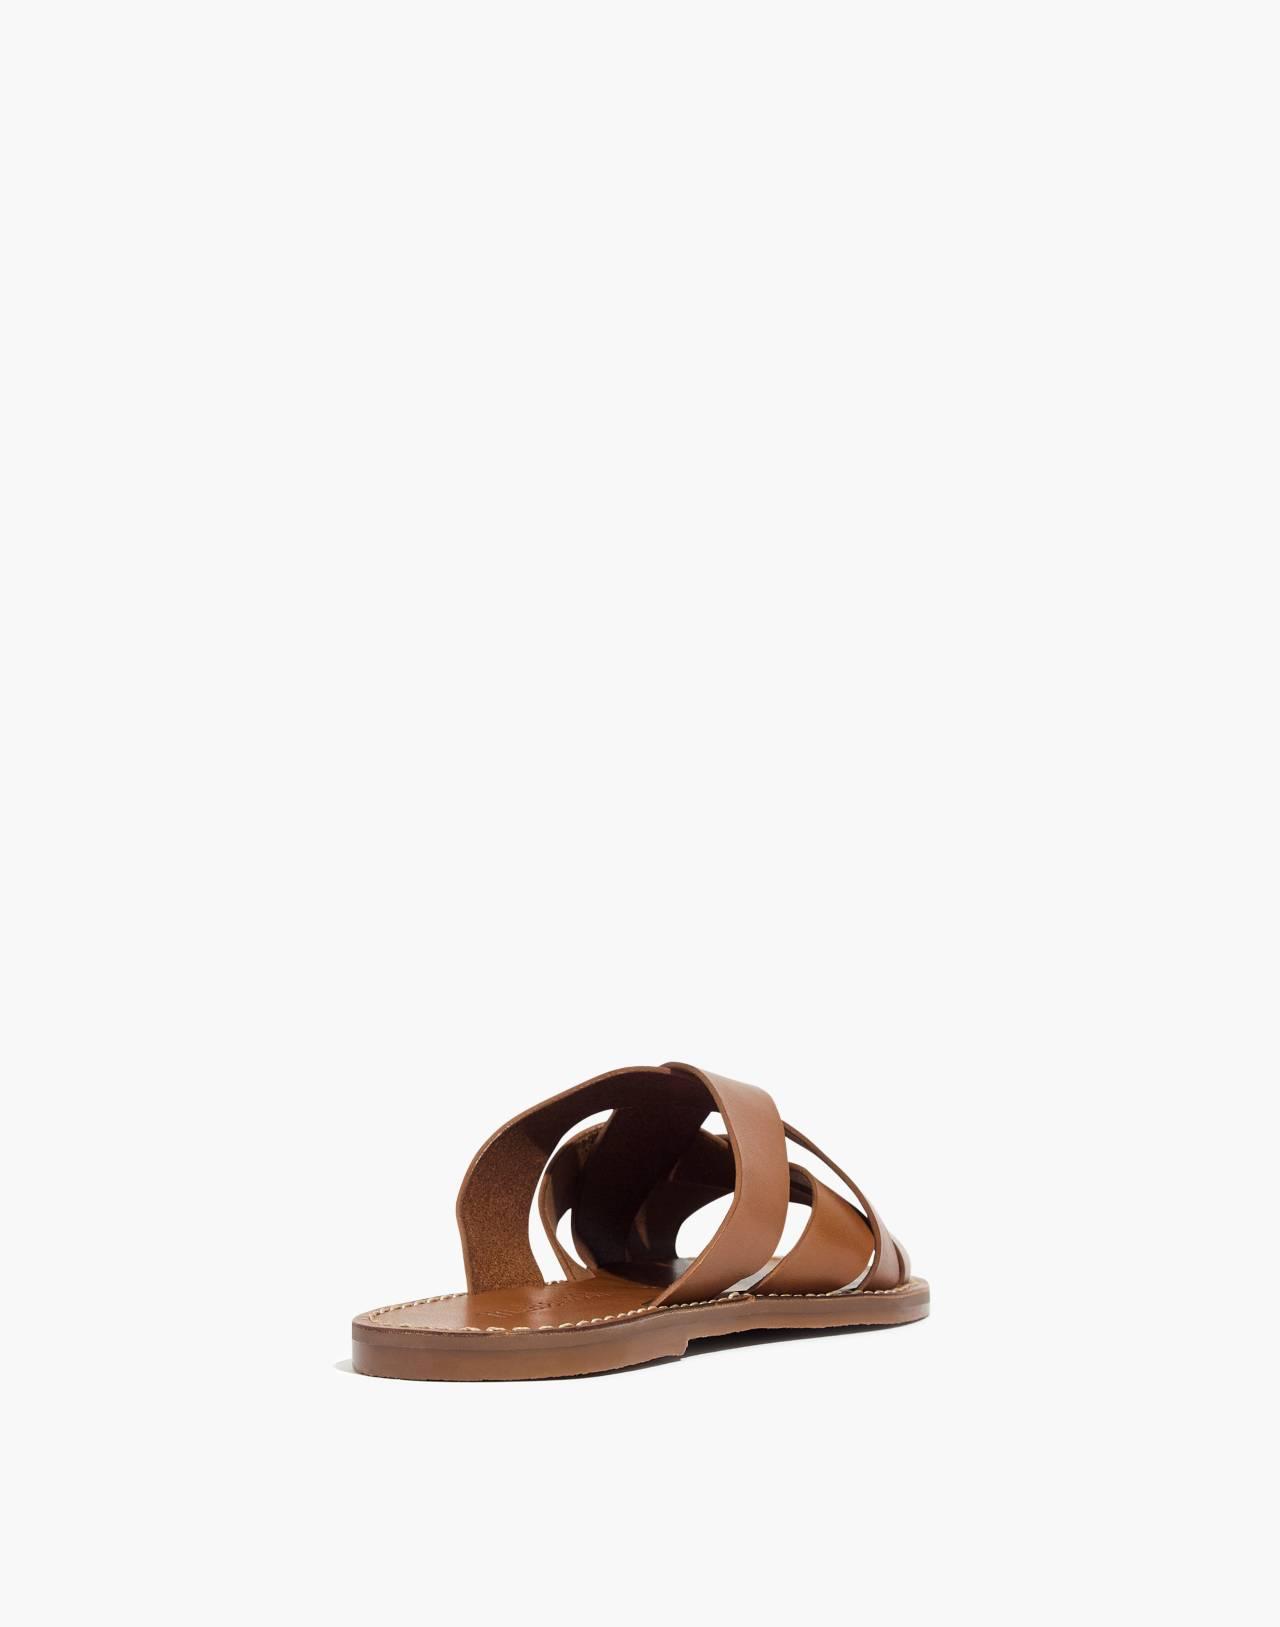 The Boardwalk Woven Slide Sandal in english saddle image 4